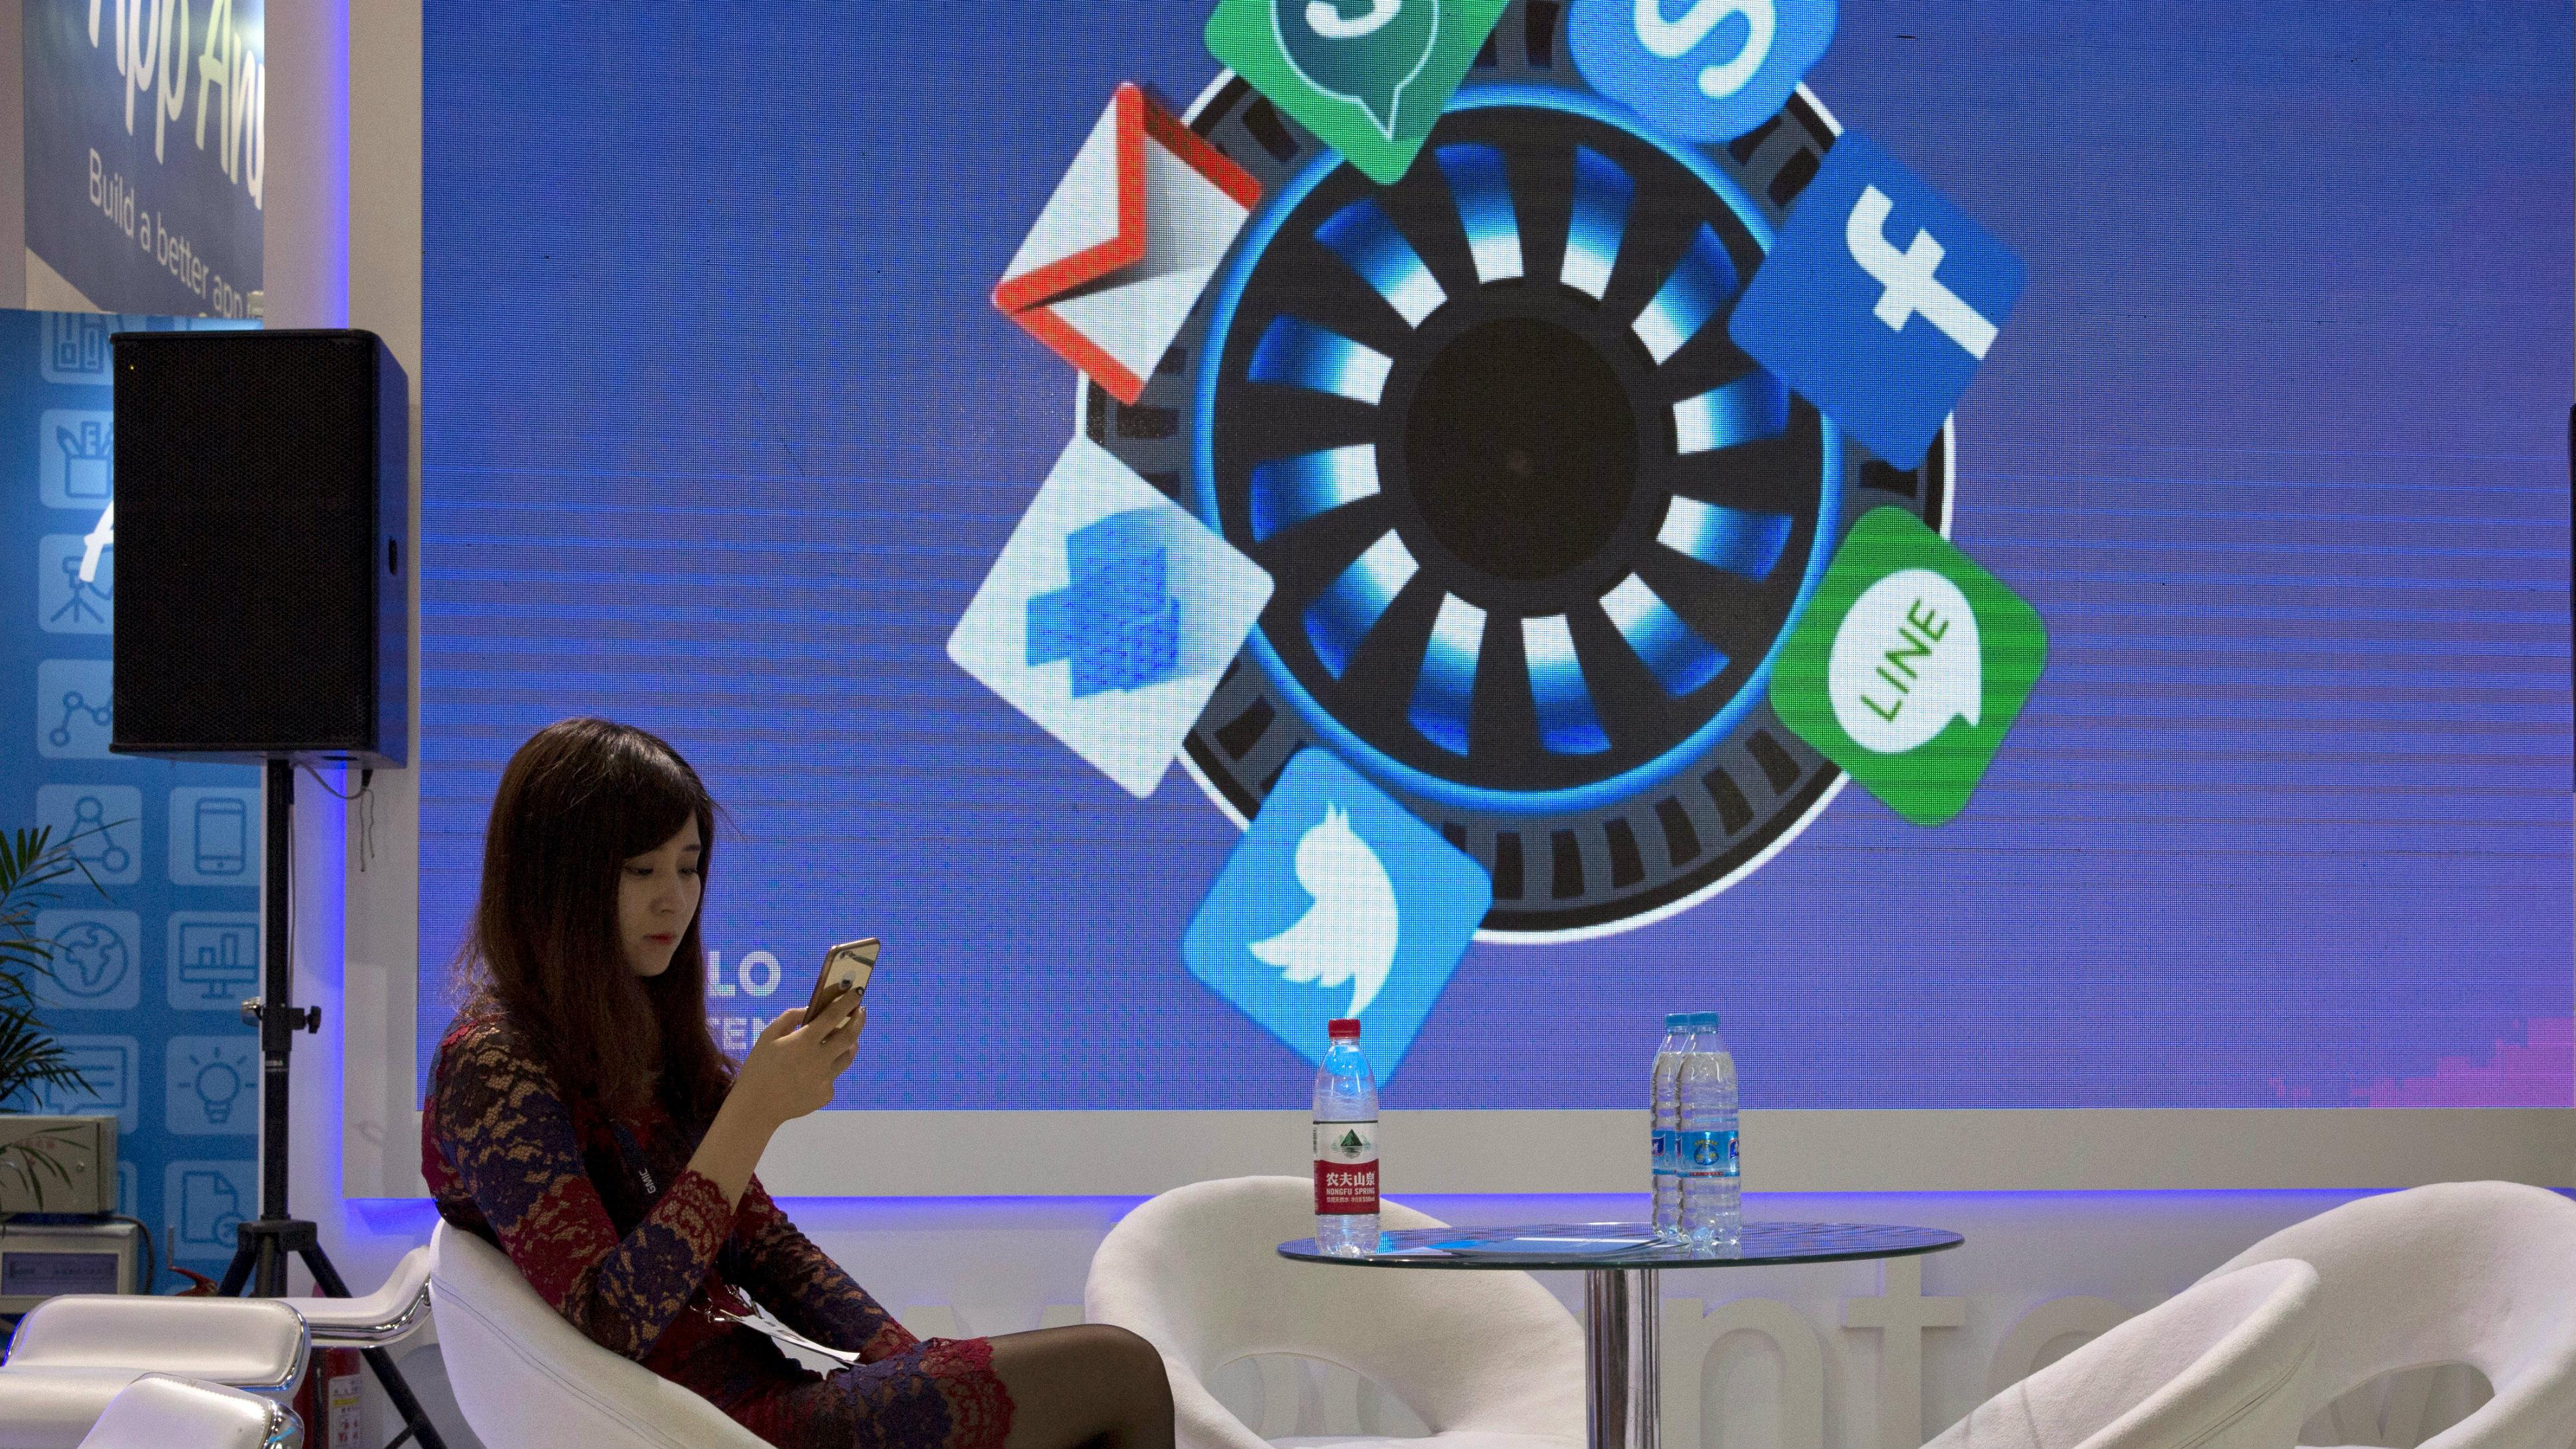 Alibaba's Ding Ding 钉钉: China's Orwellian version of Slack